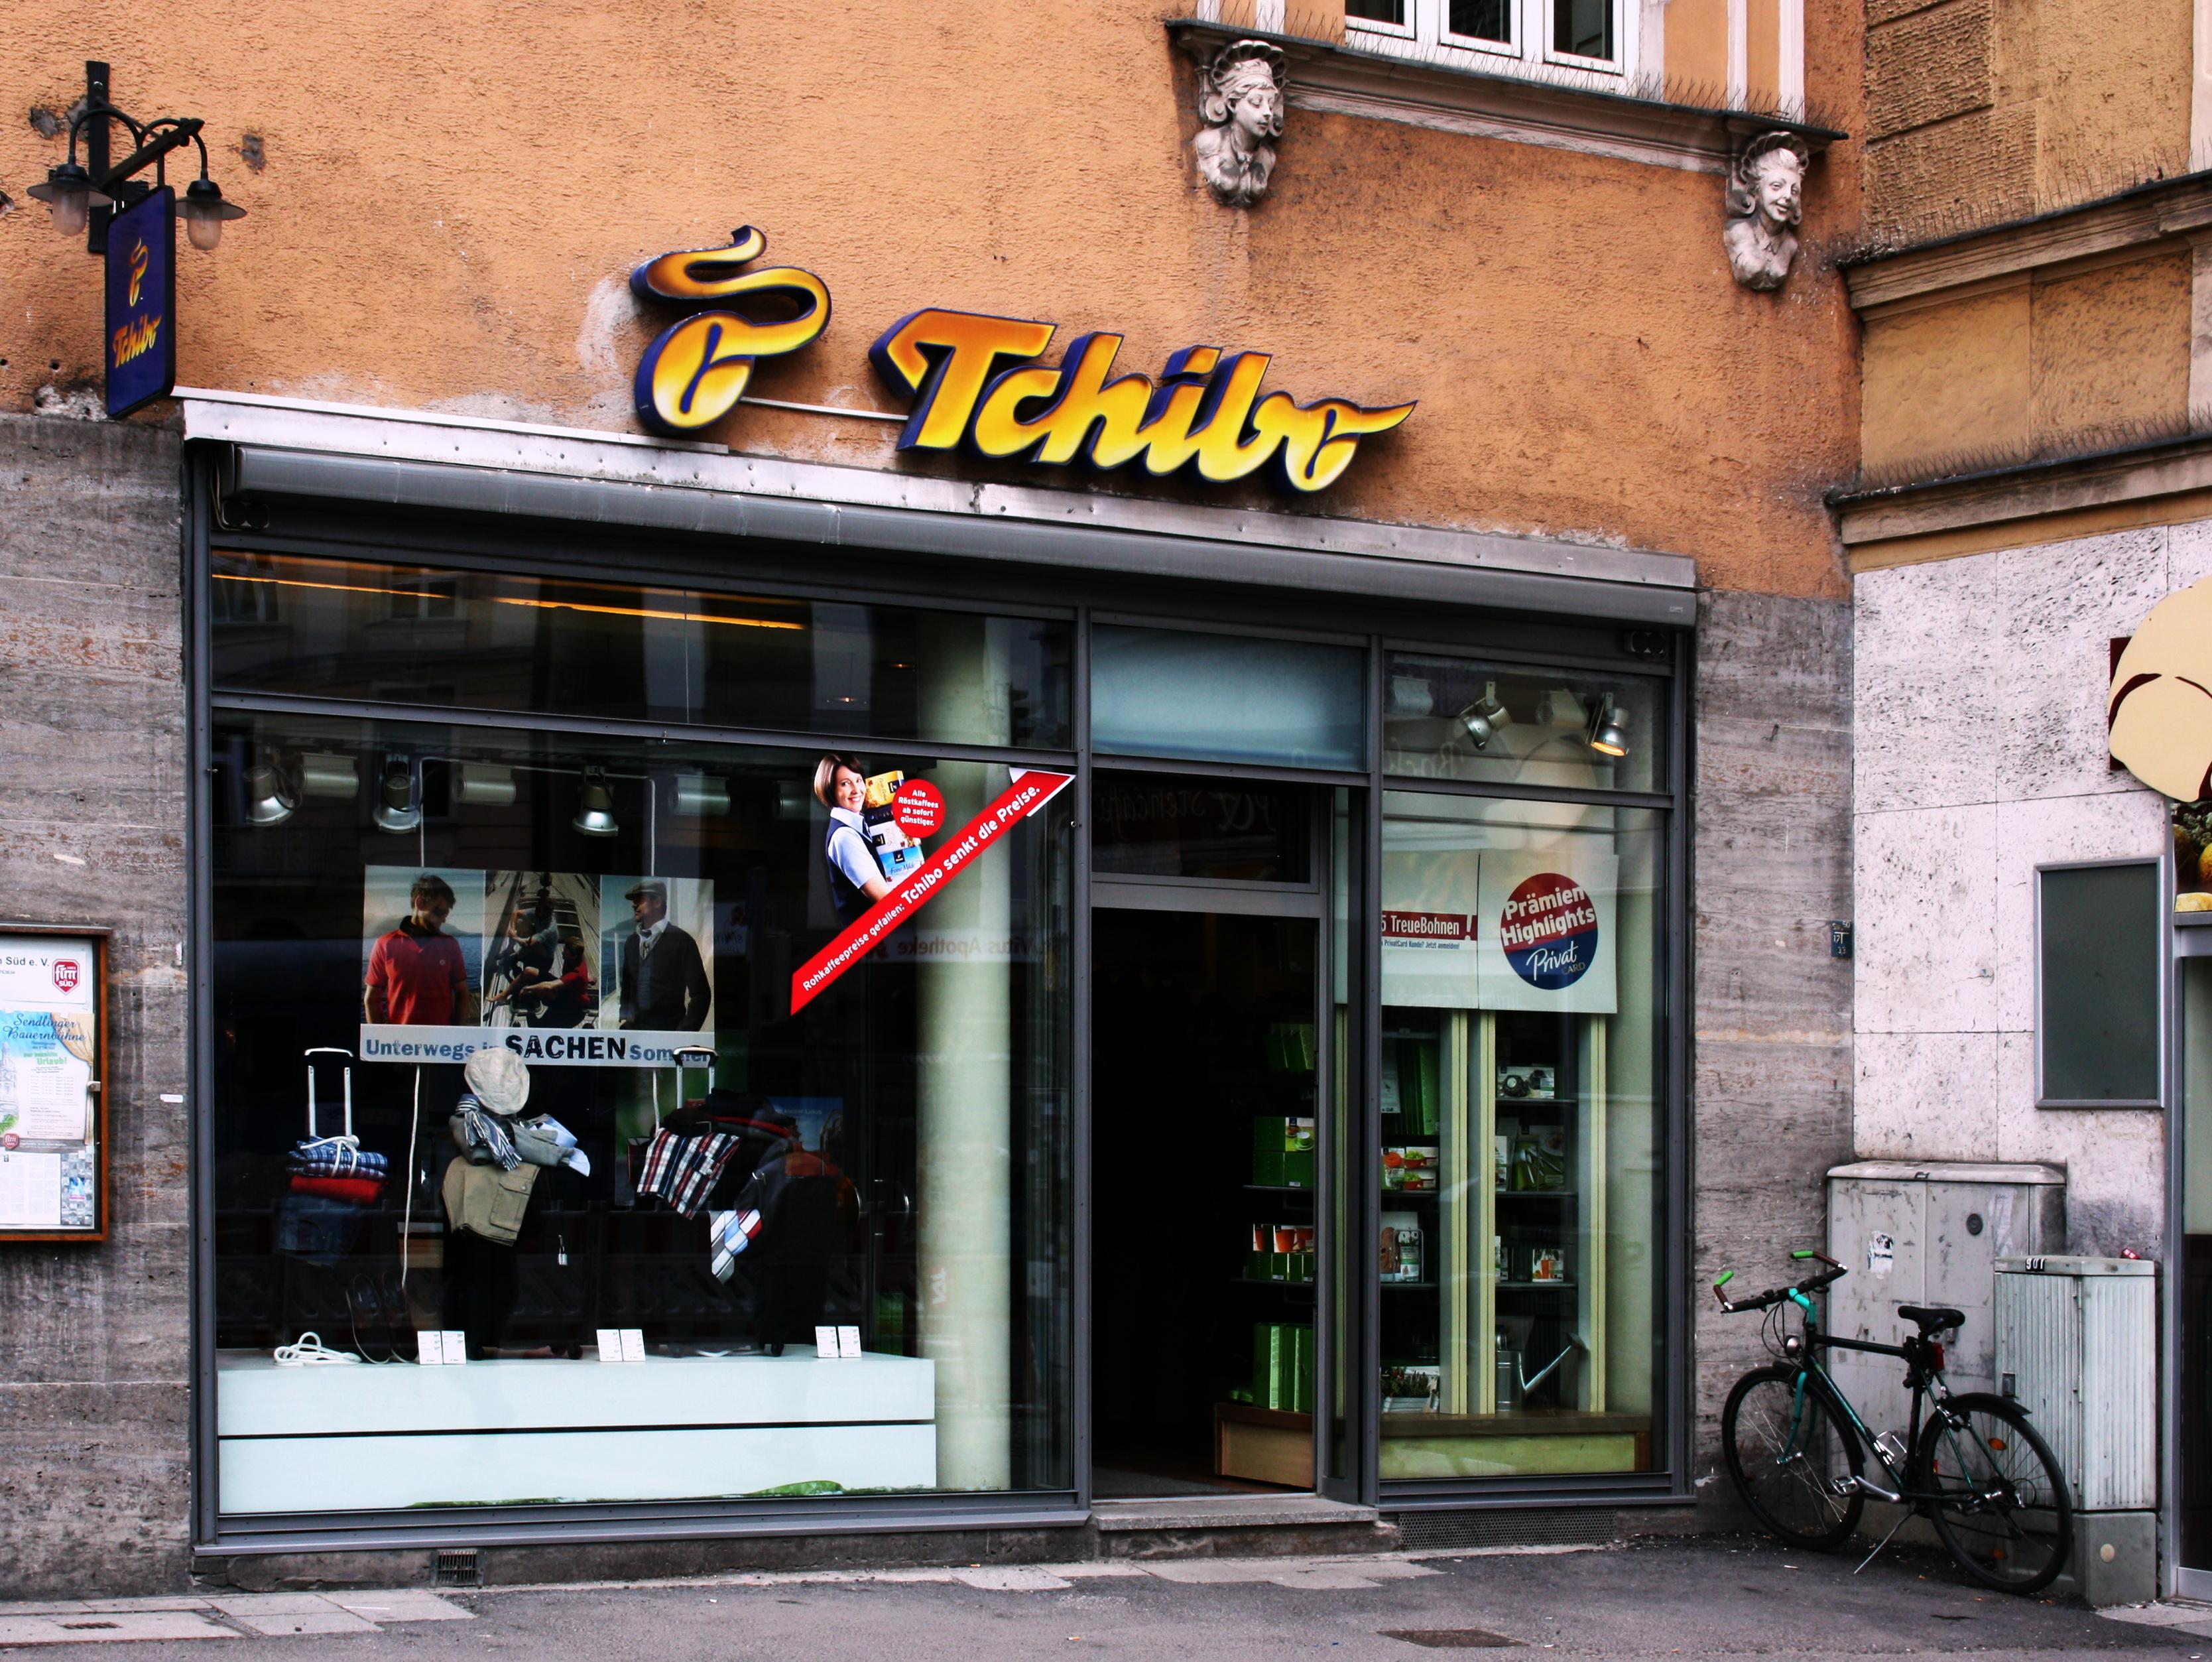 tischbo